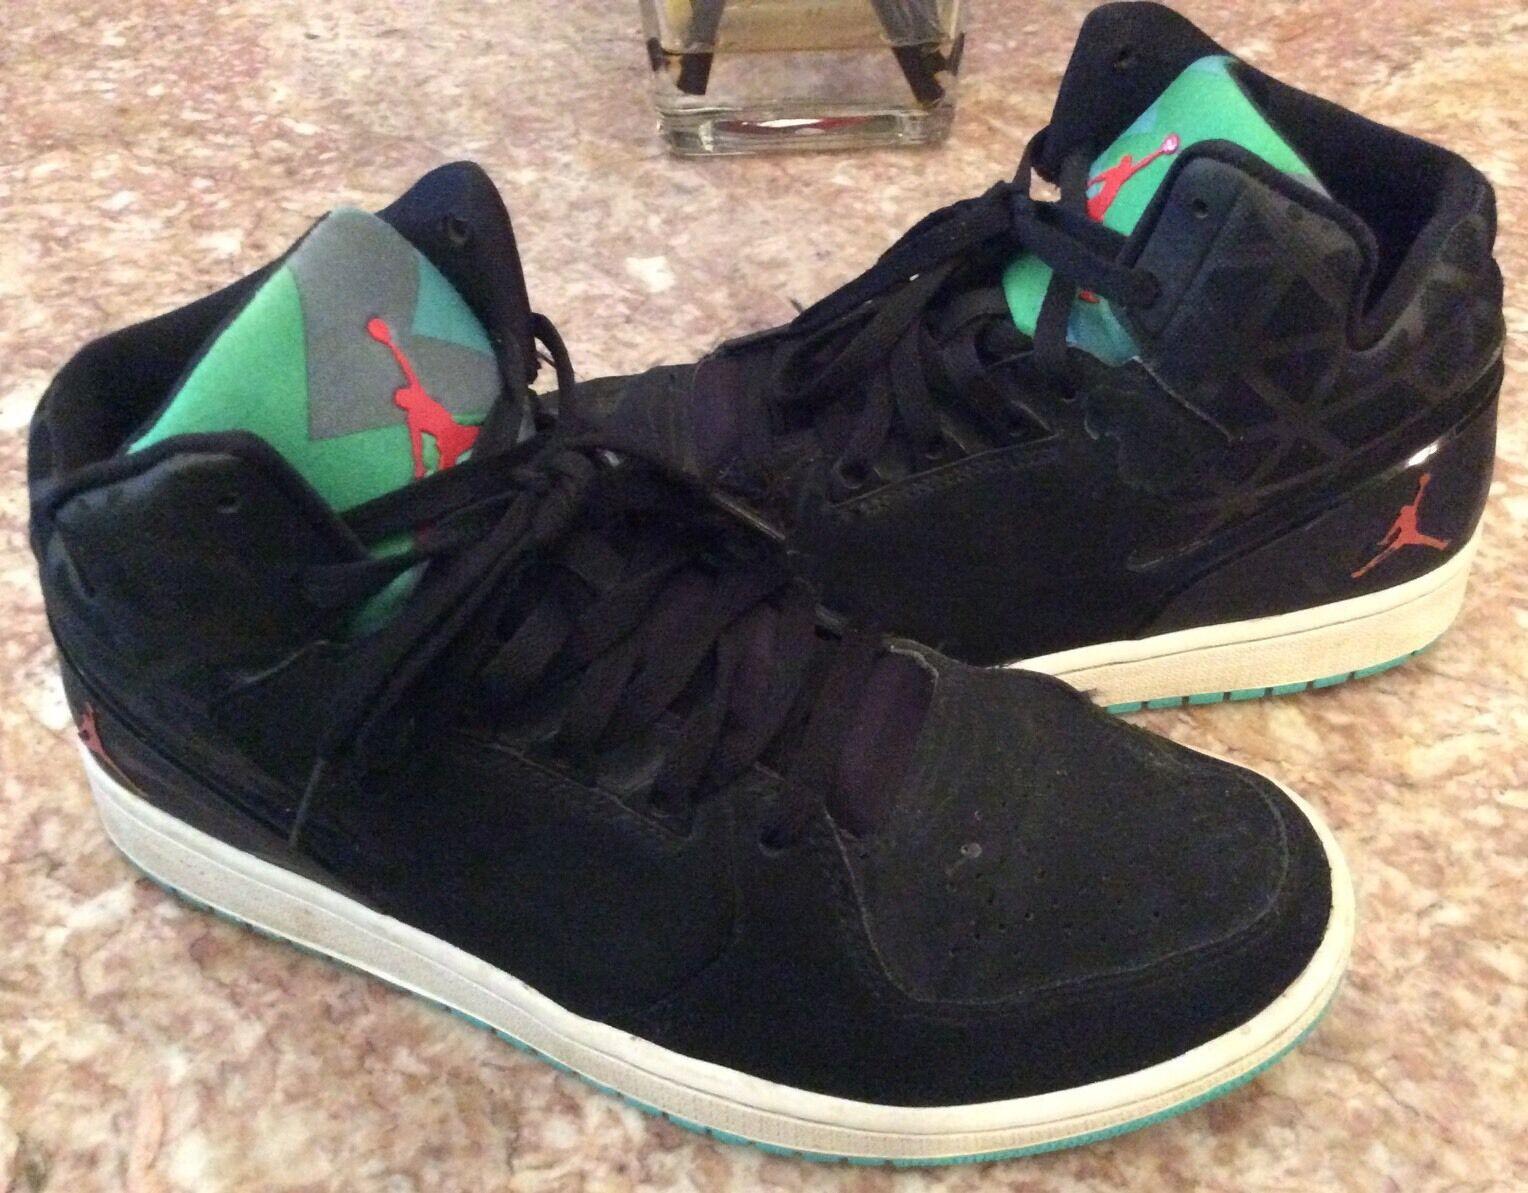 Wild casual shoes Nike Air Jordan 1 Flight 3 Men's Black/turquoise Sneakers Sz 11 - 743188-006